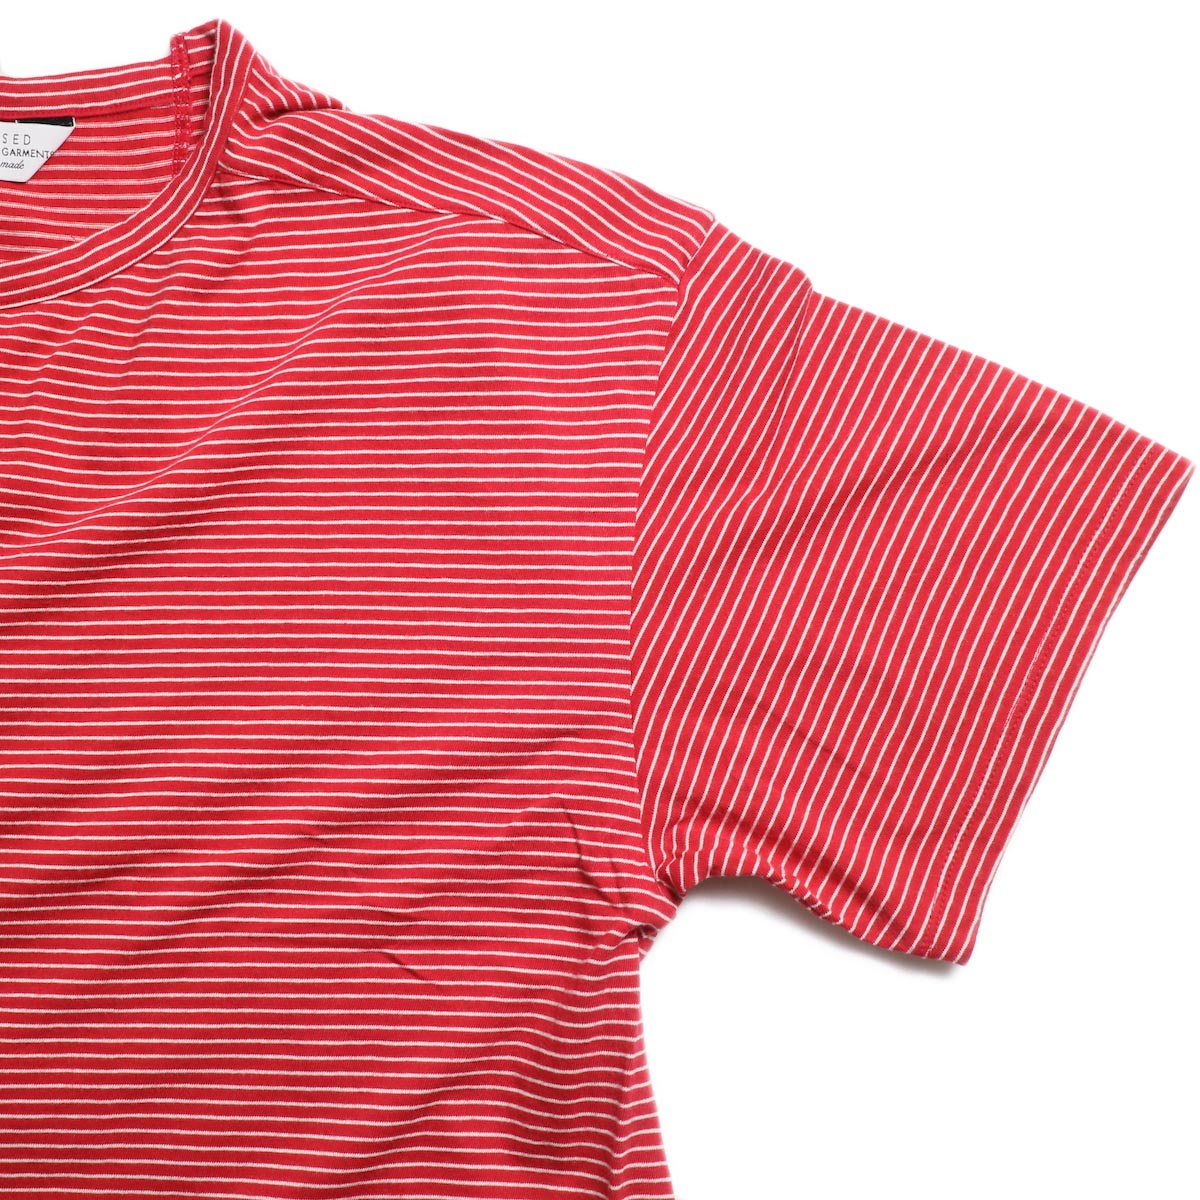 UNUSED / US1546 Border S/S Tee (Red×White) 袖